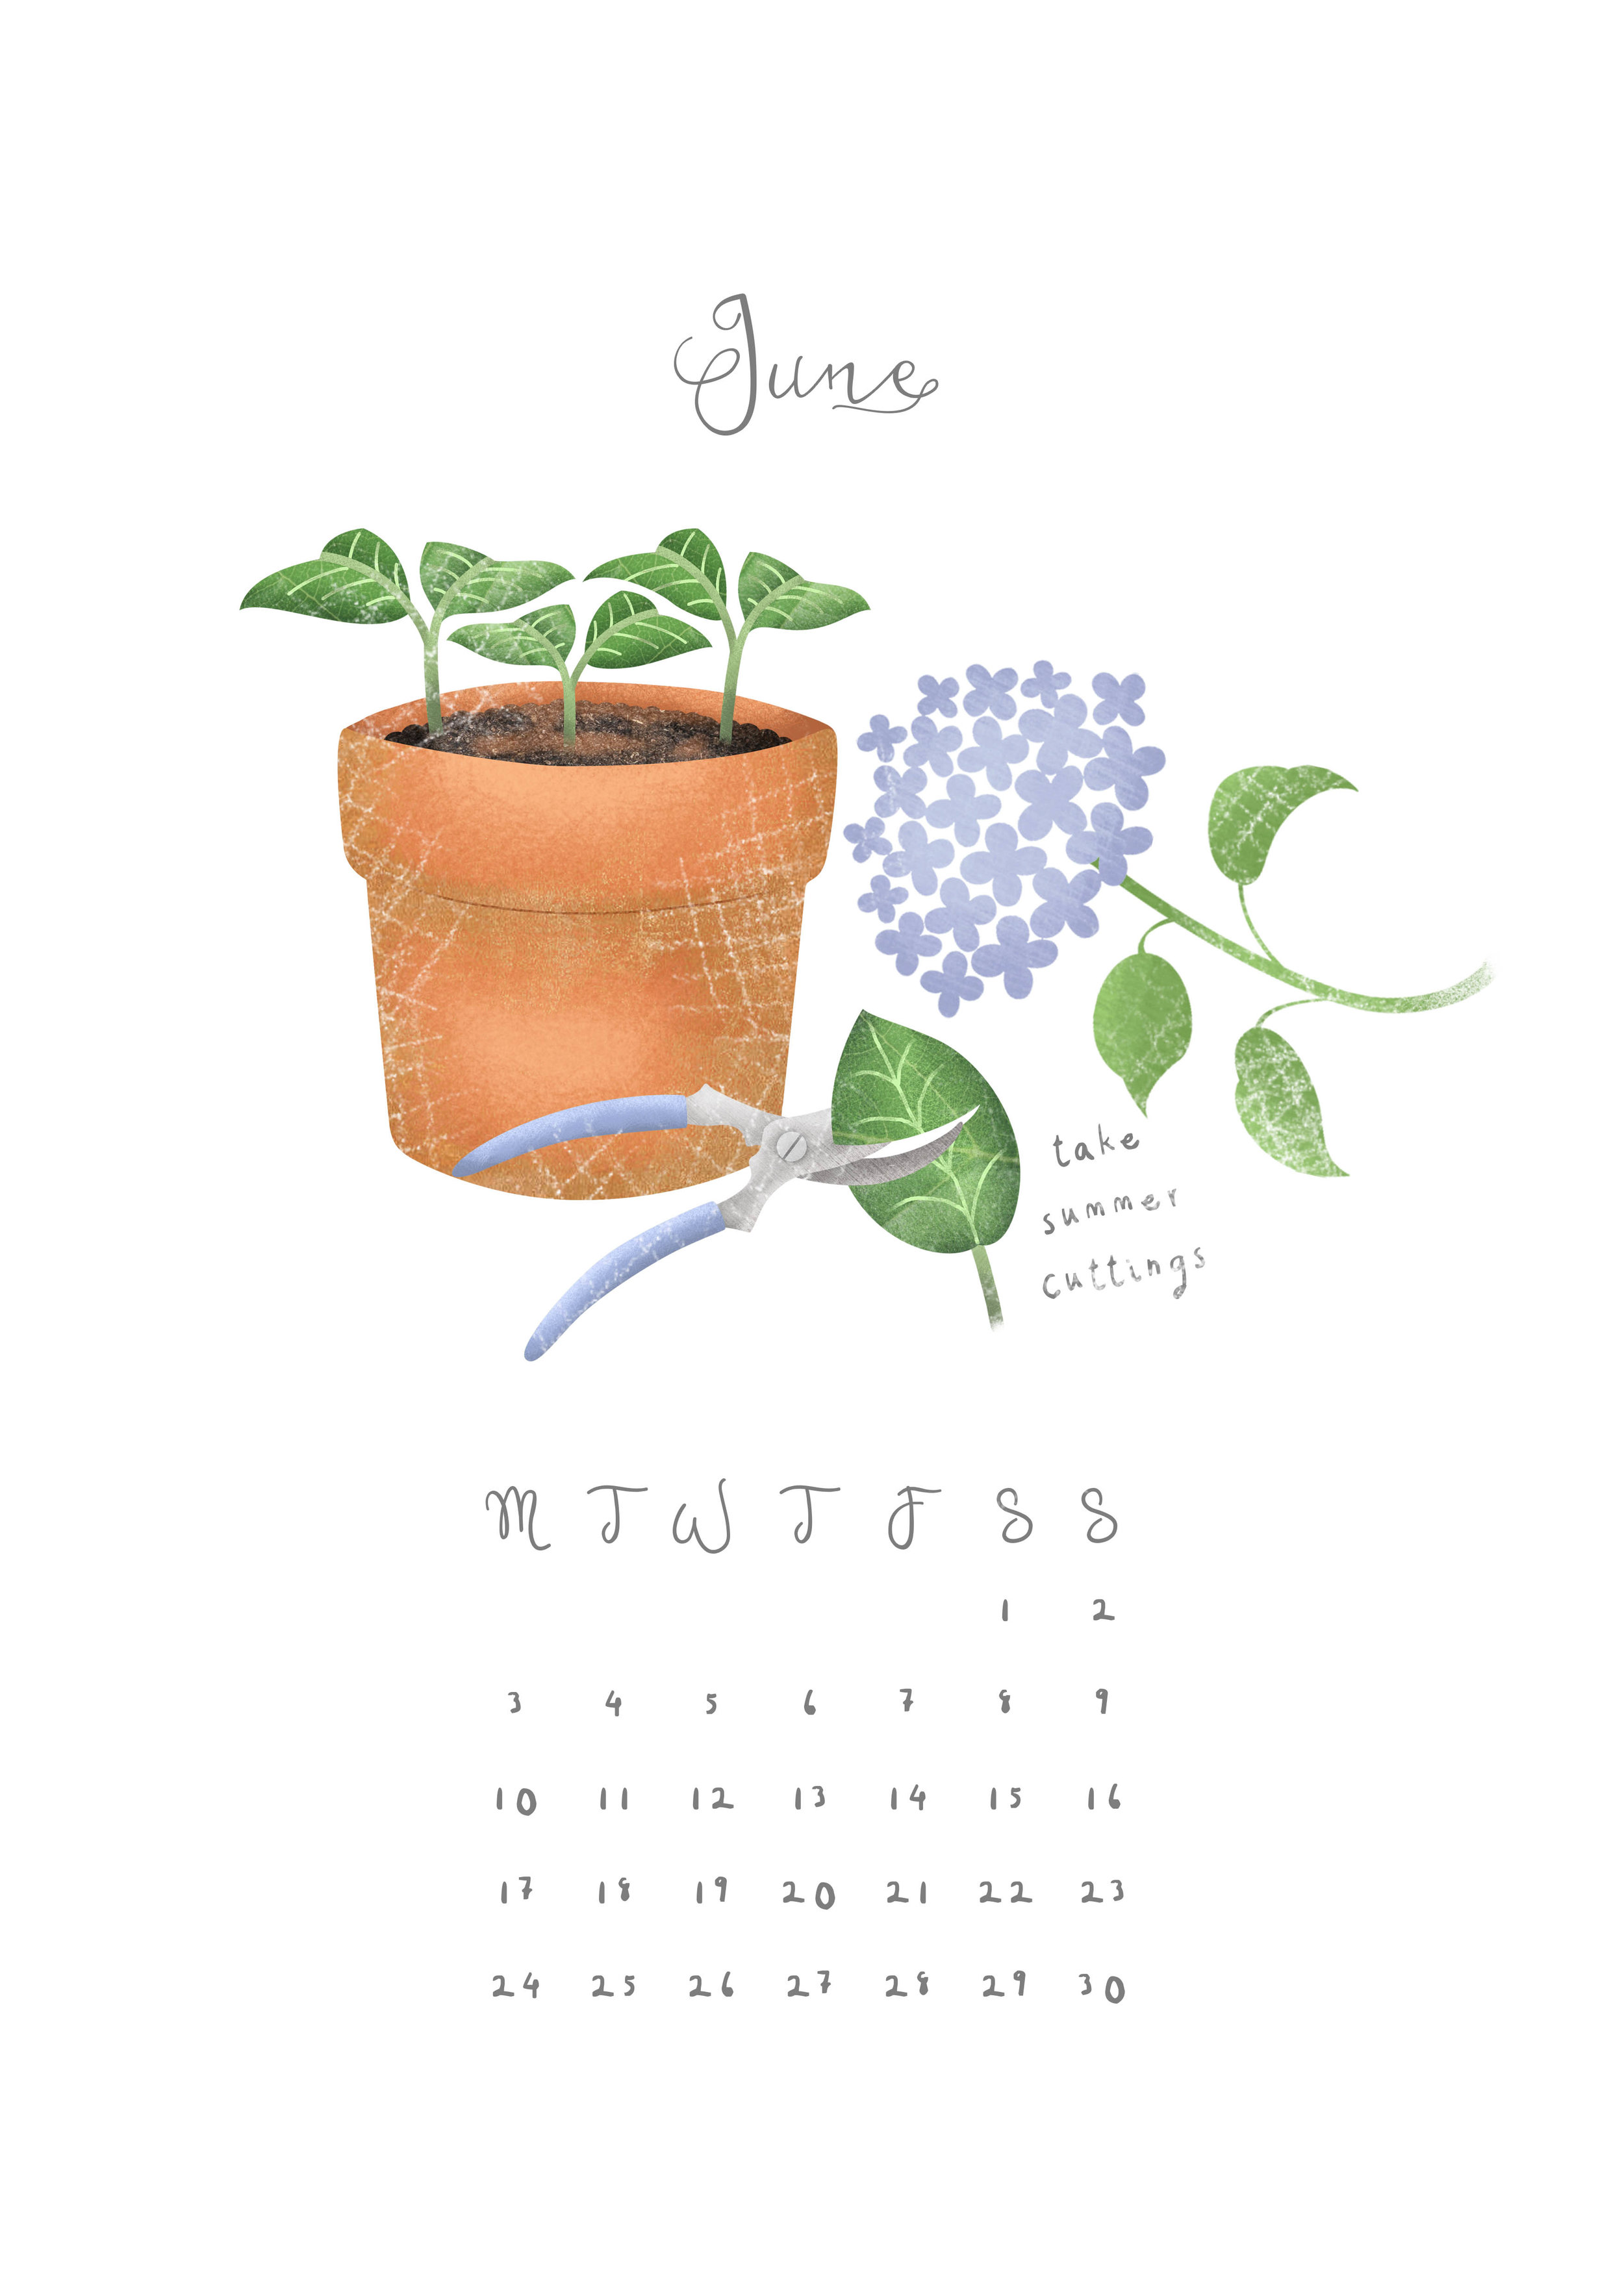 Hannah Weeks Illustration - June - Summer Cuttings - A4.jpg